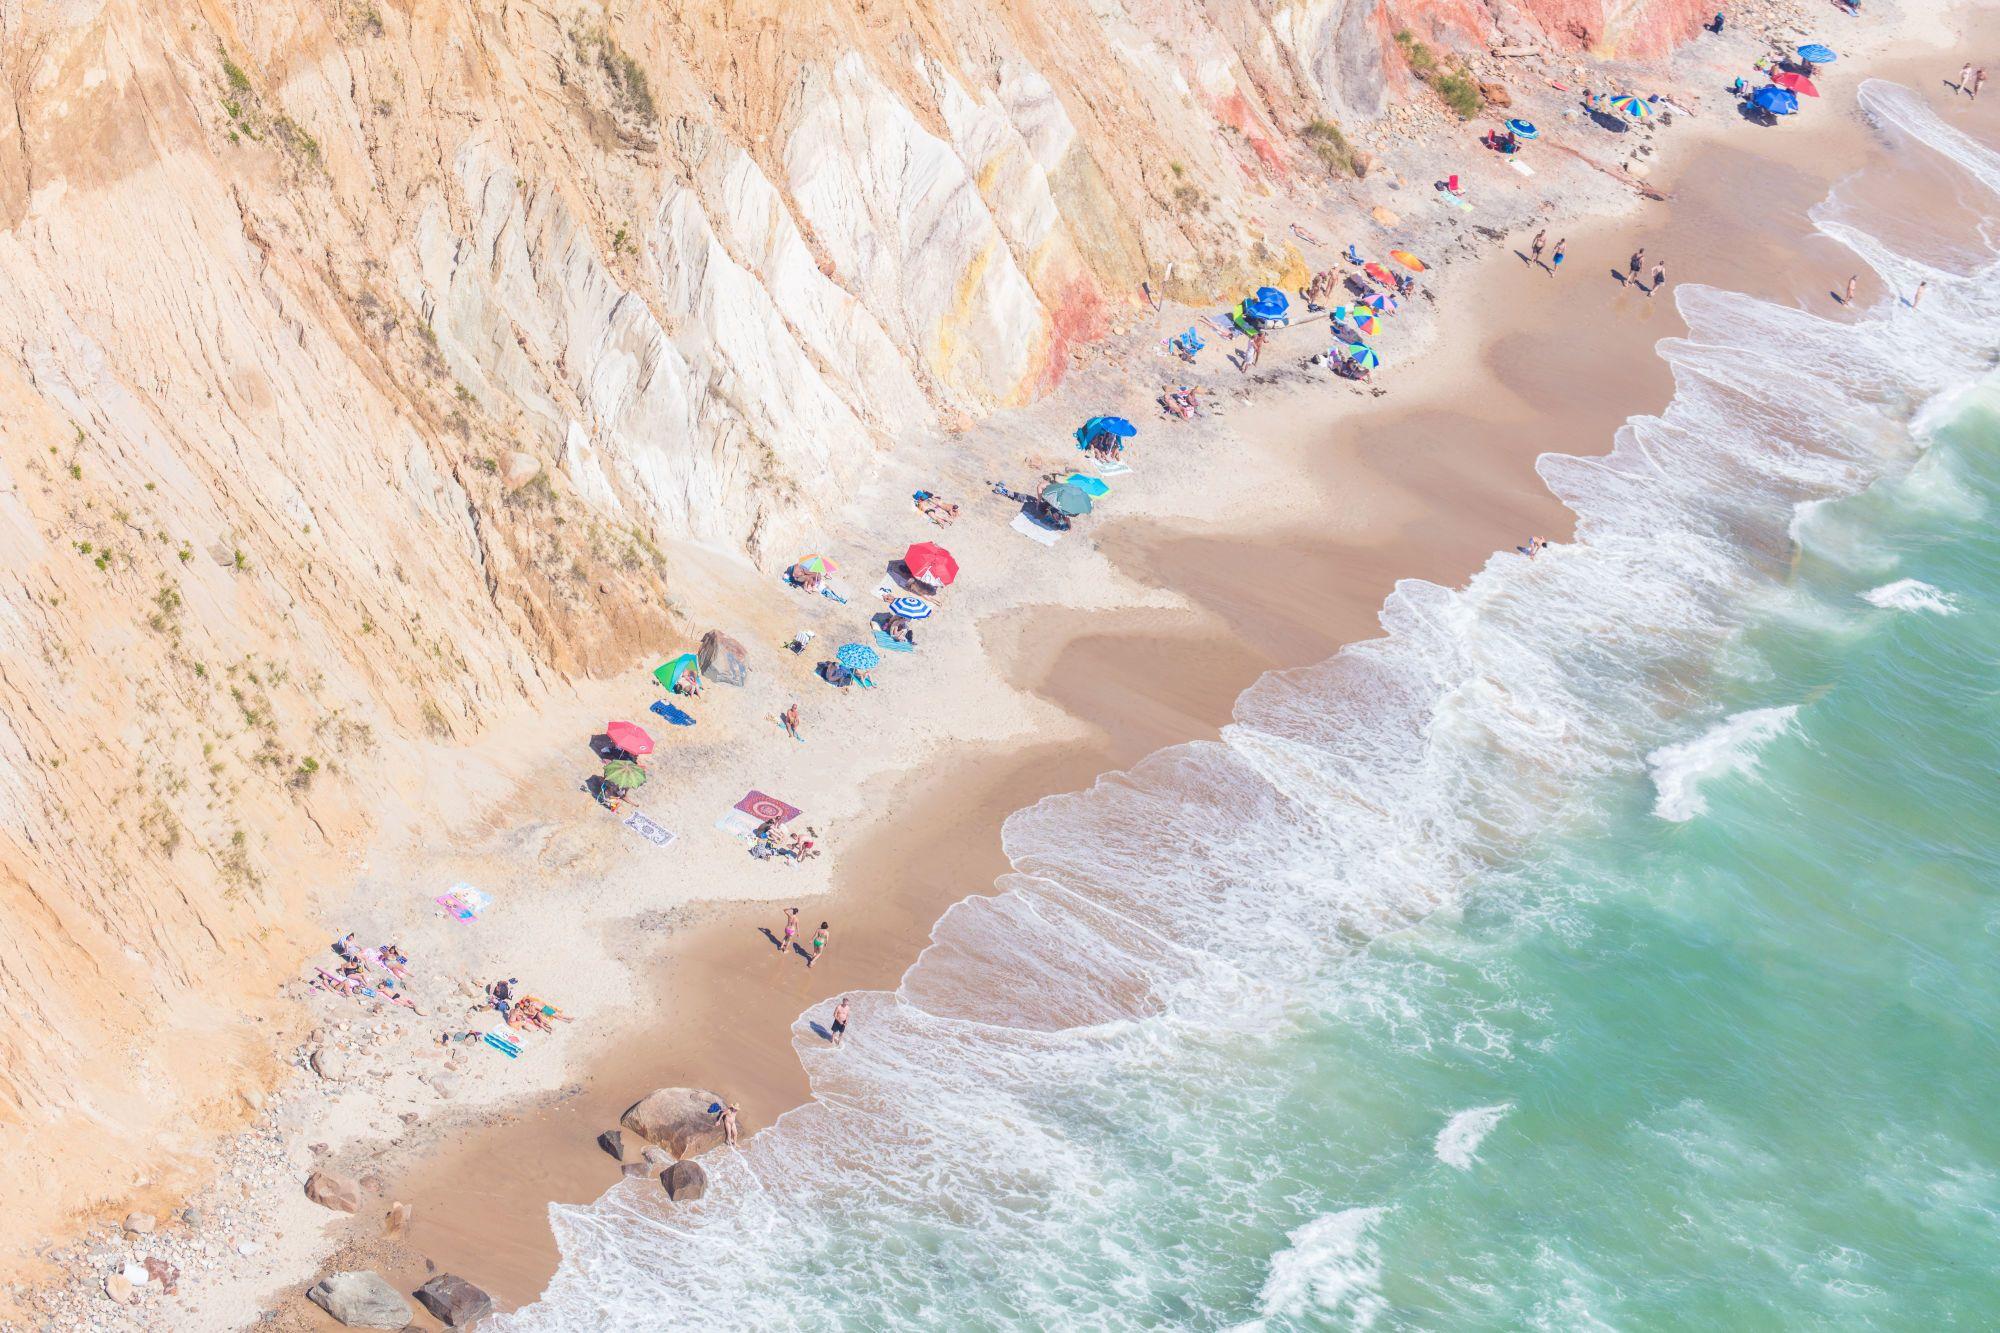 Marthas vineyard nude beach pics Gray Malin S Top 10 Nude Beach Prints Gray Malin